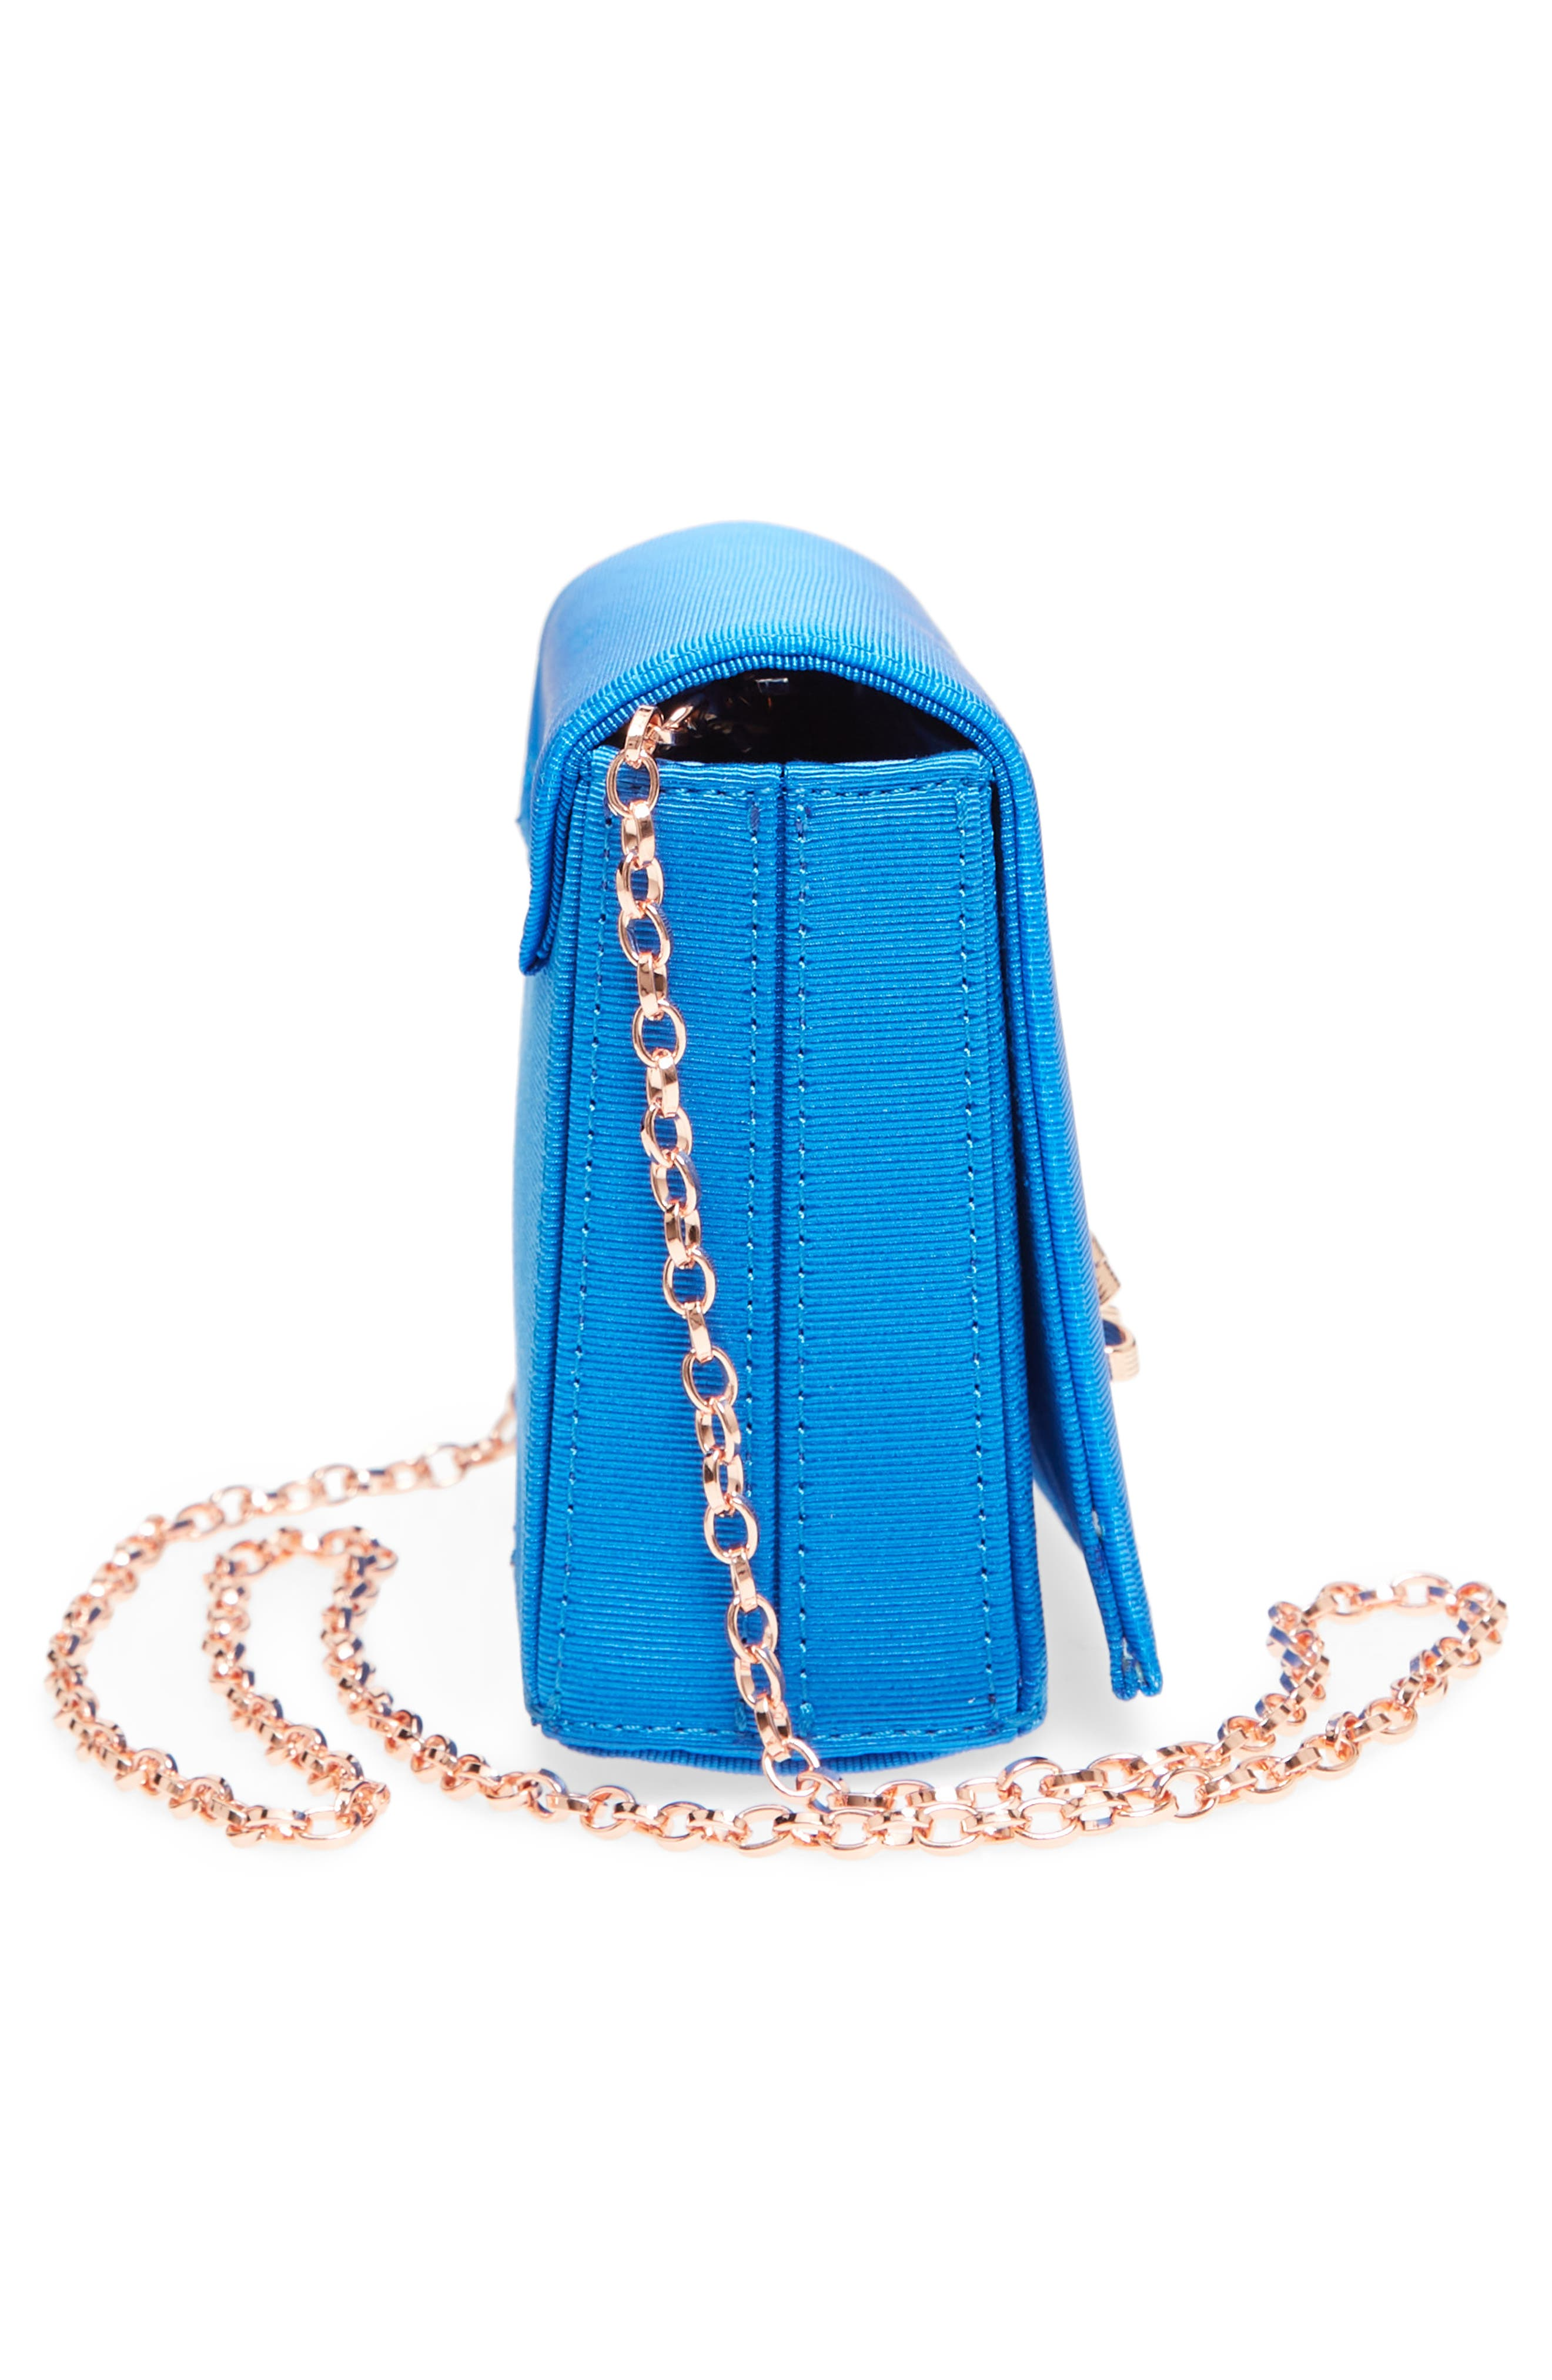 Harmony Print Evening Bag,                             Alternate thumbnail 5, color,                             Bright Blue